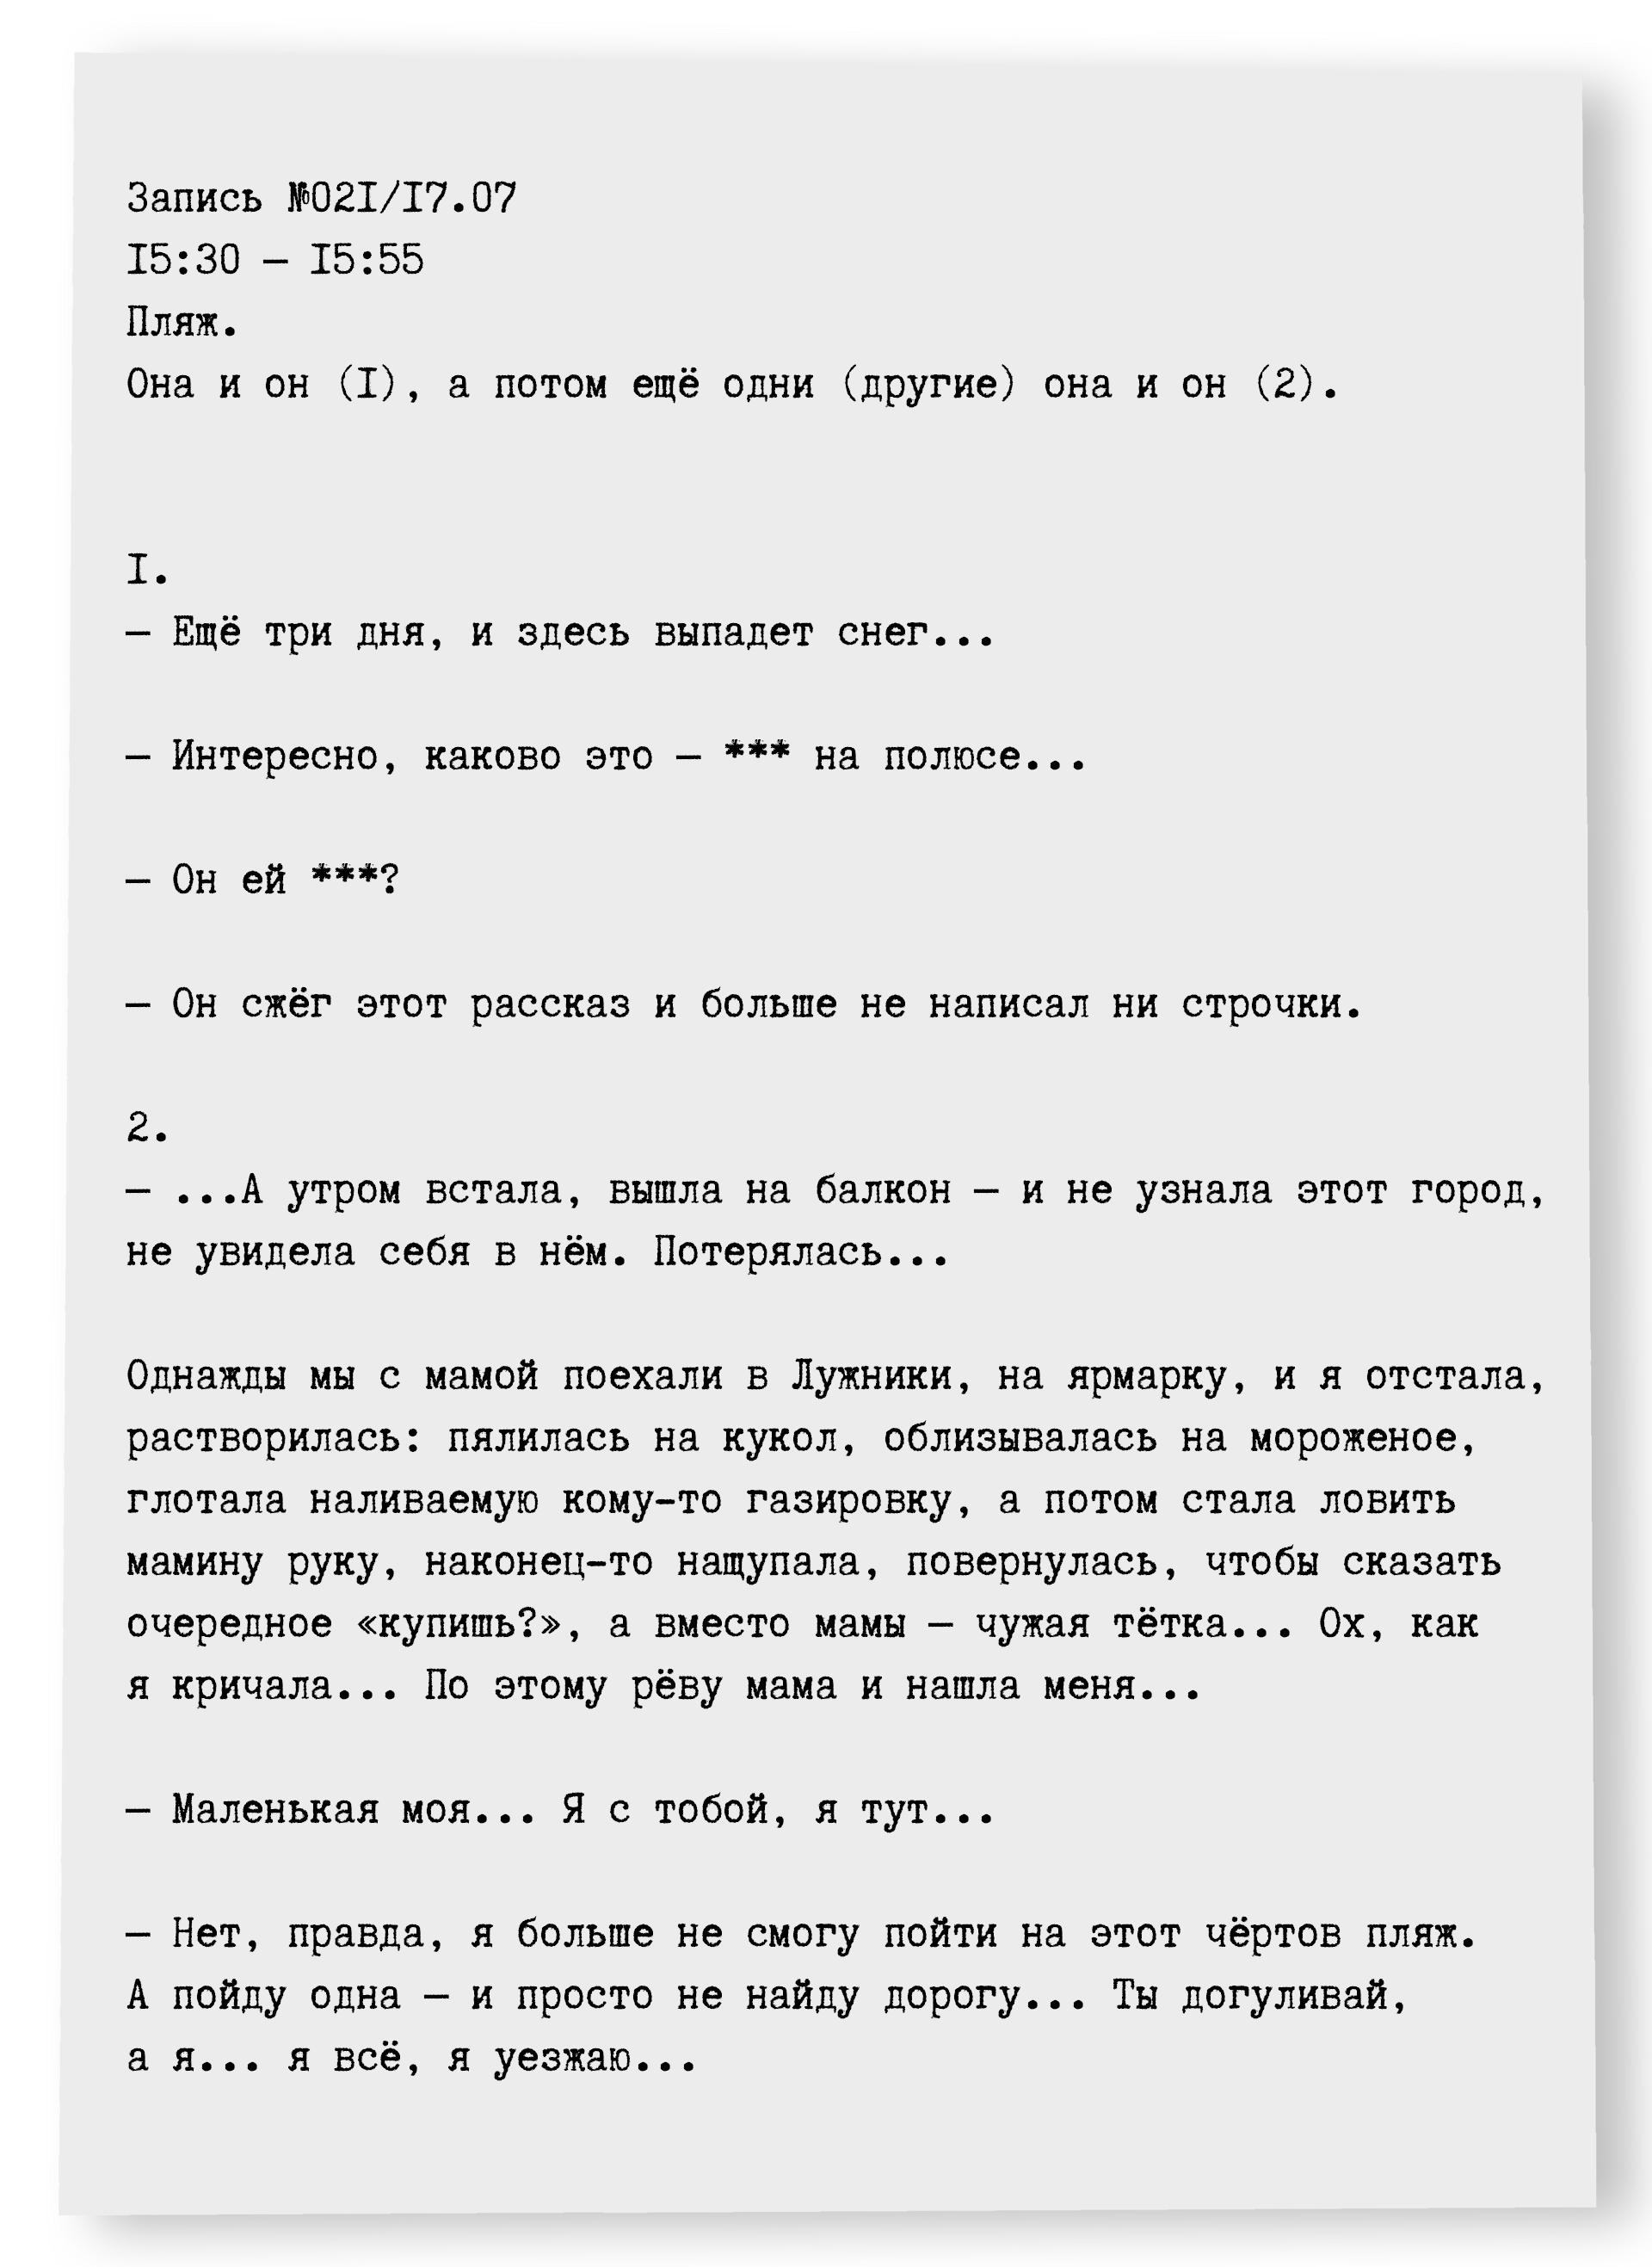 paper_1920-2634_3